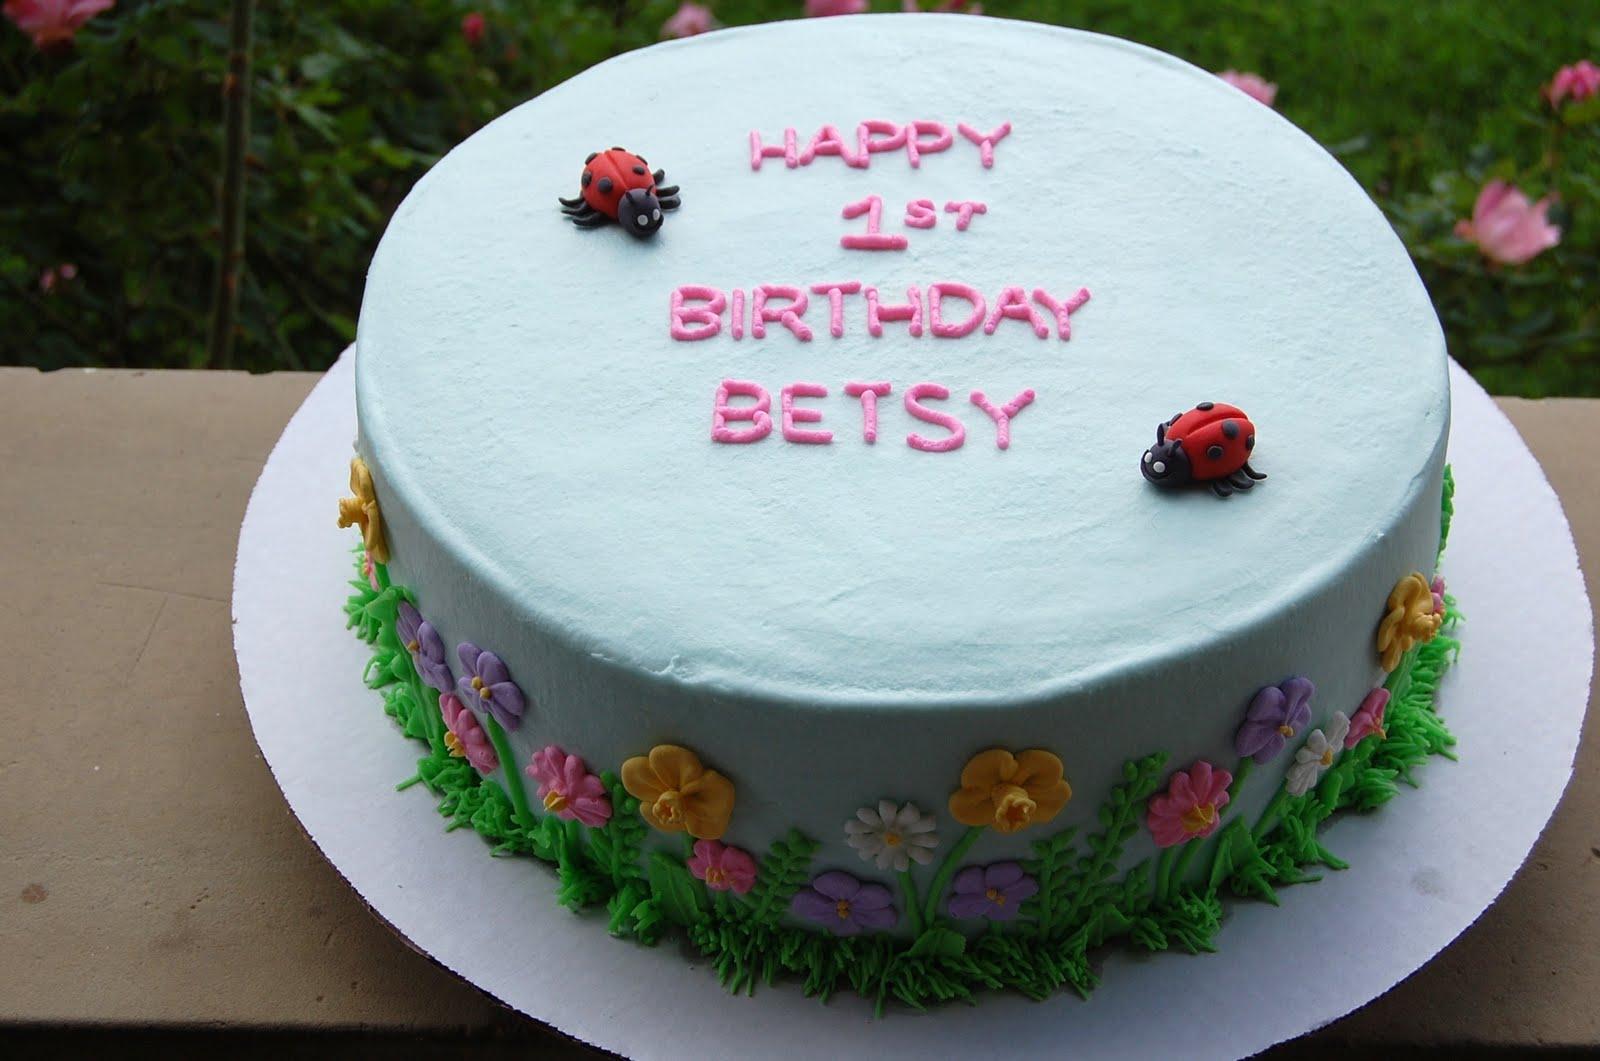 Robyn S Cakes Happy Birthday Baby Betsy